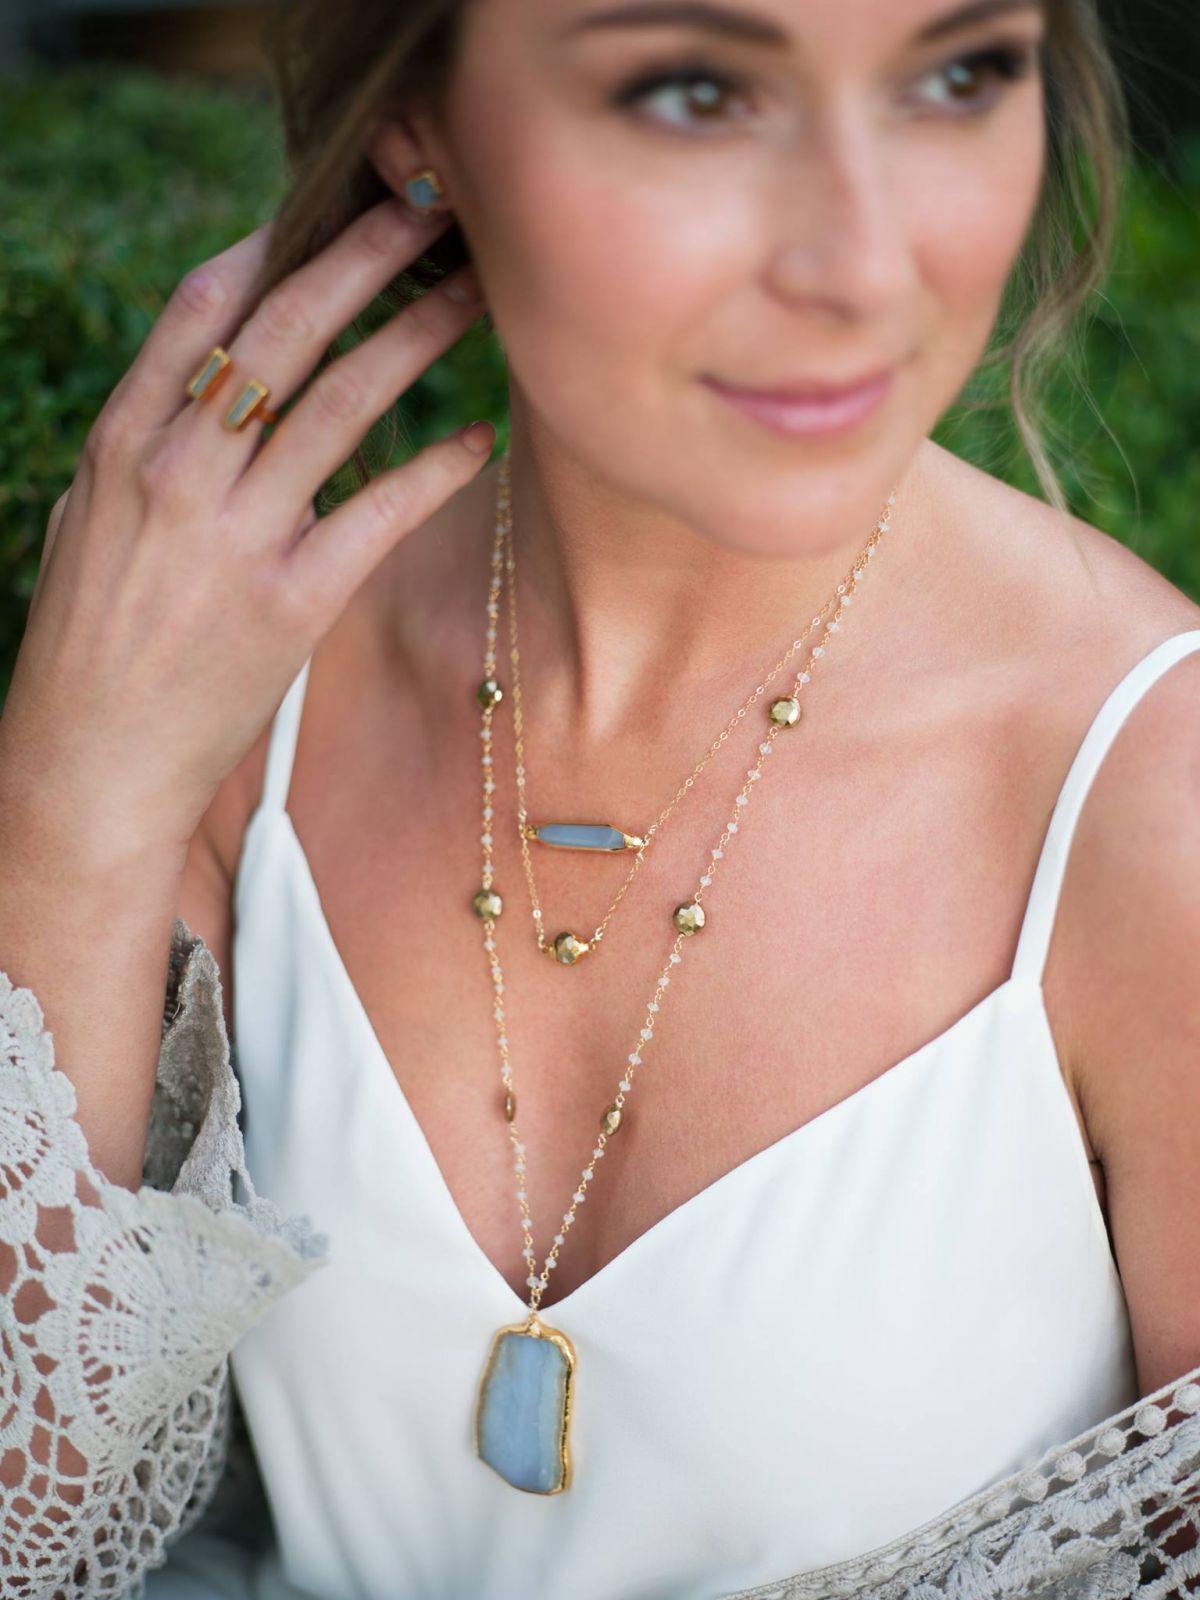 ALEXA VEGA for Robyn Rhodes Jewelry, Spring/Summer 2016